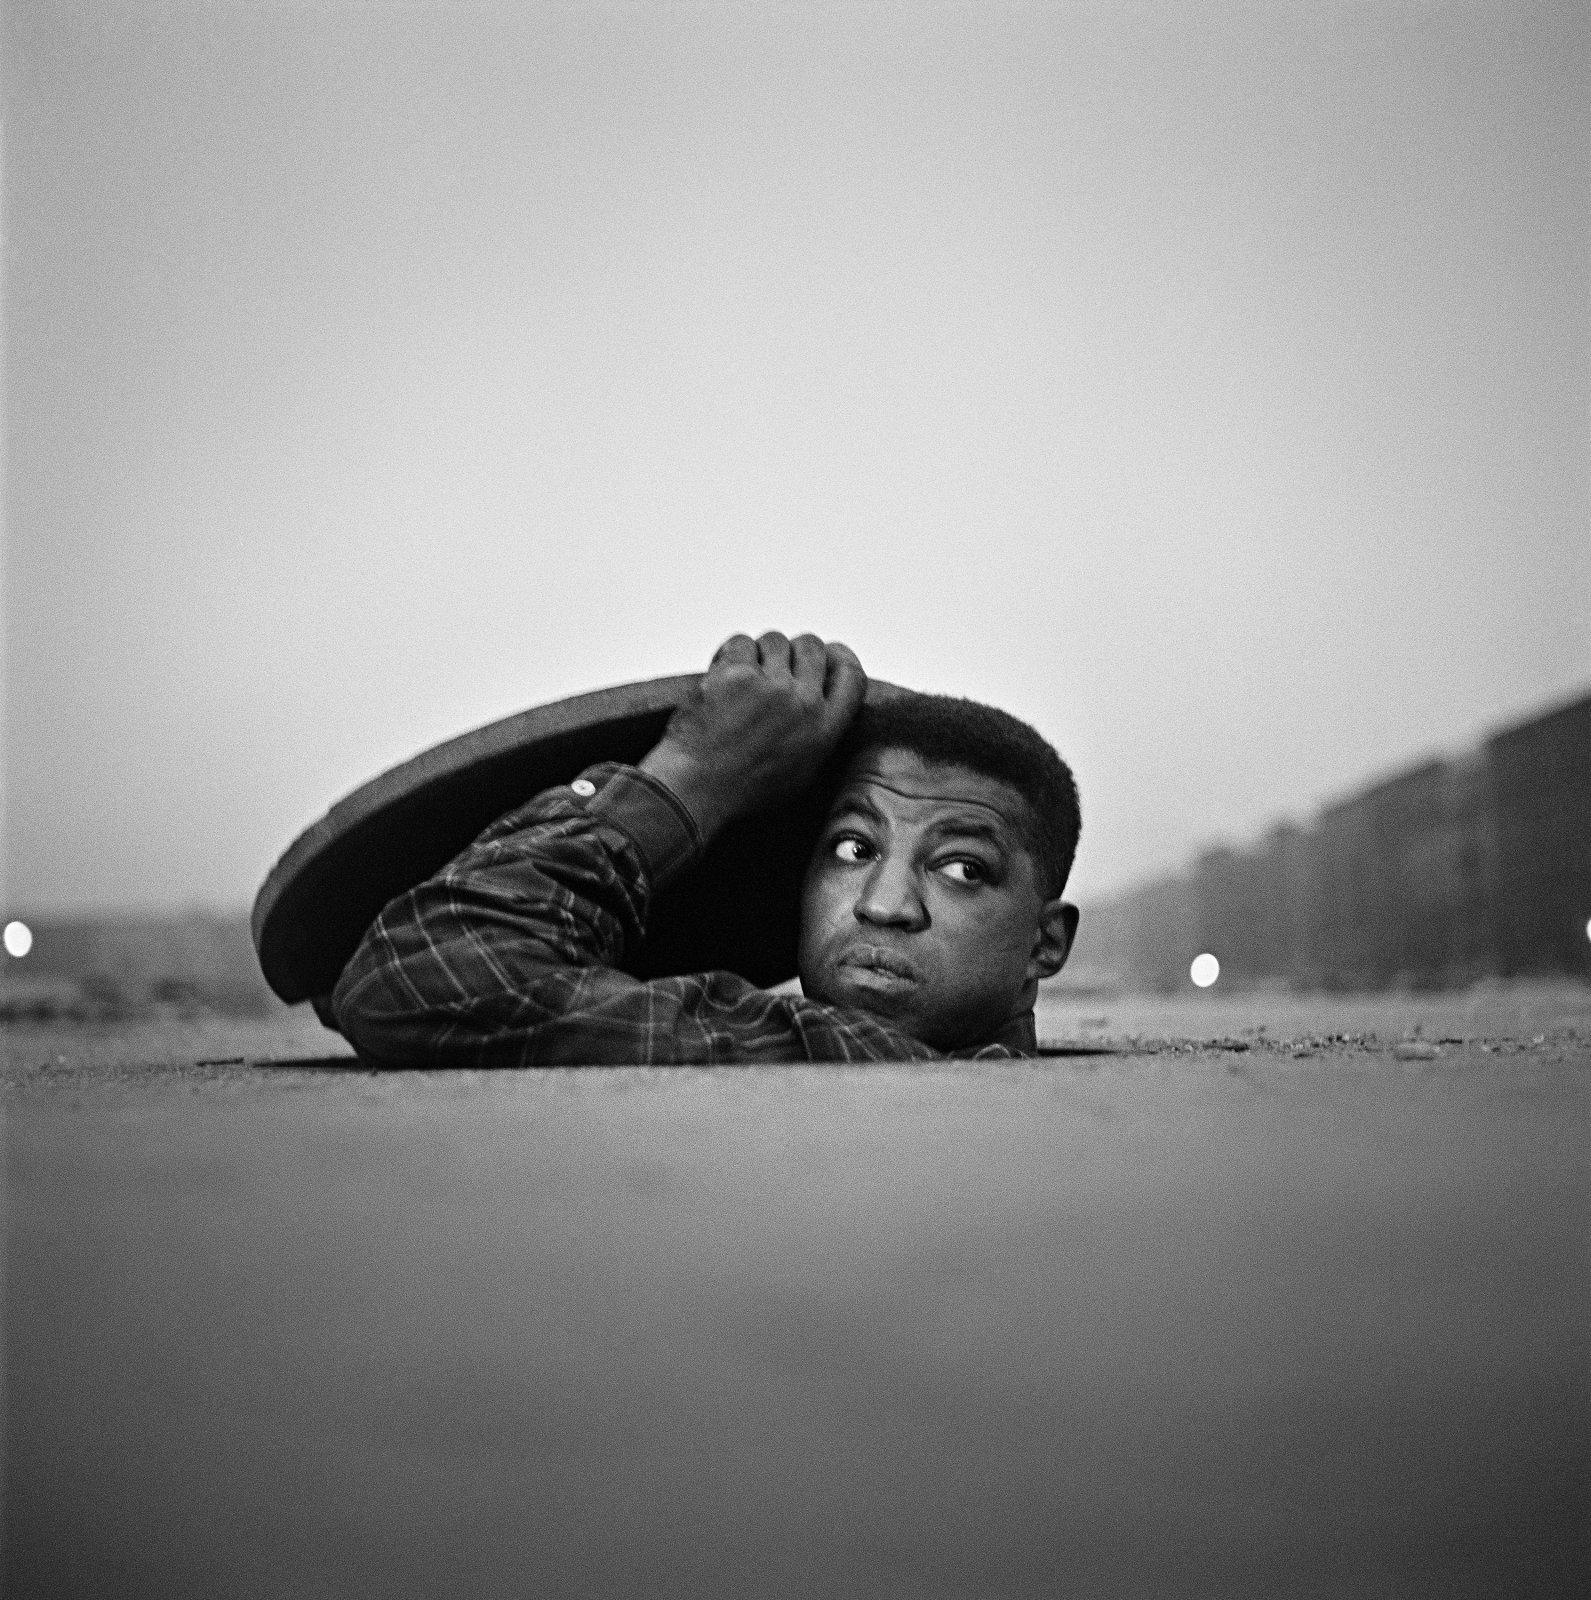 The Invisible Man, Harlem, New York, 1952 © Gordon Parks / Courtesy The Gordon Parks Foundation